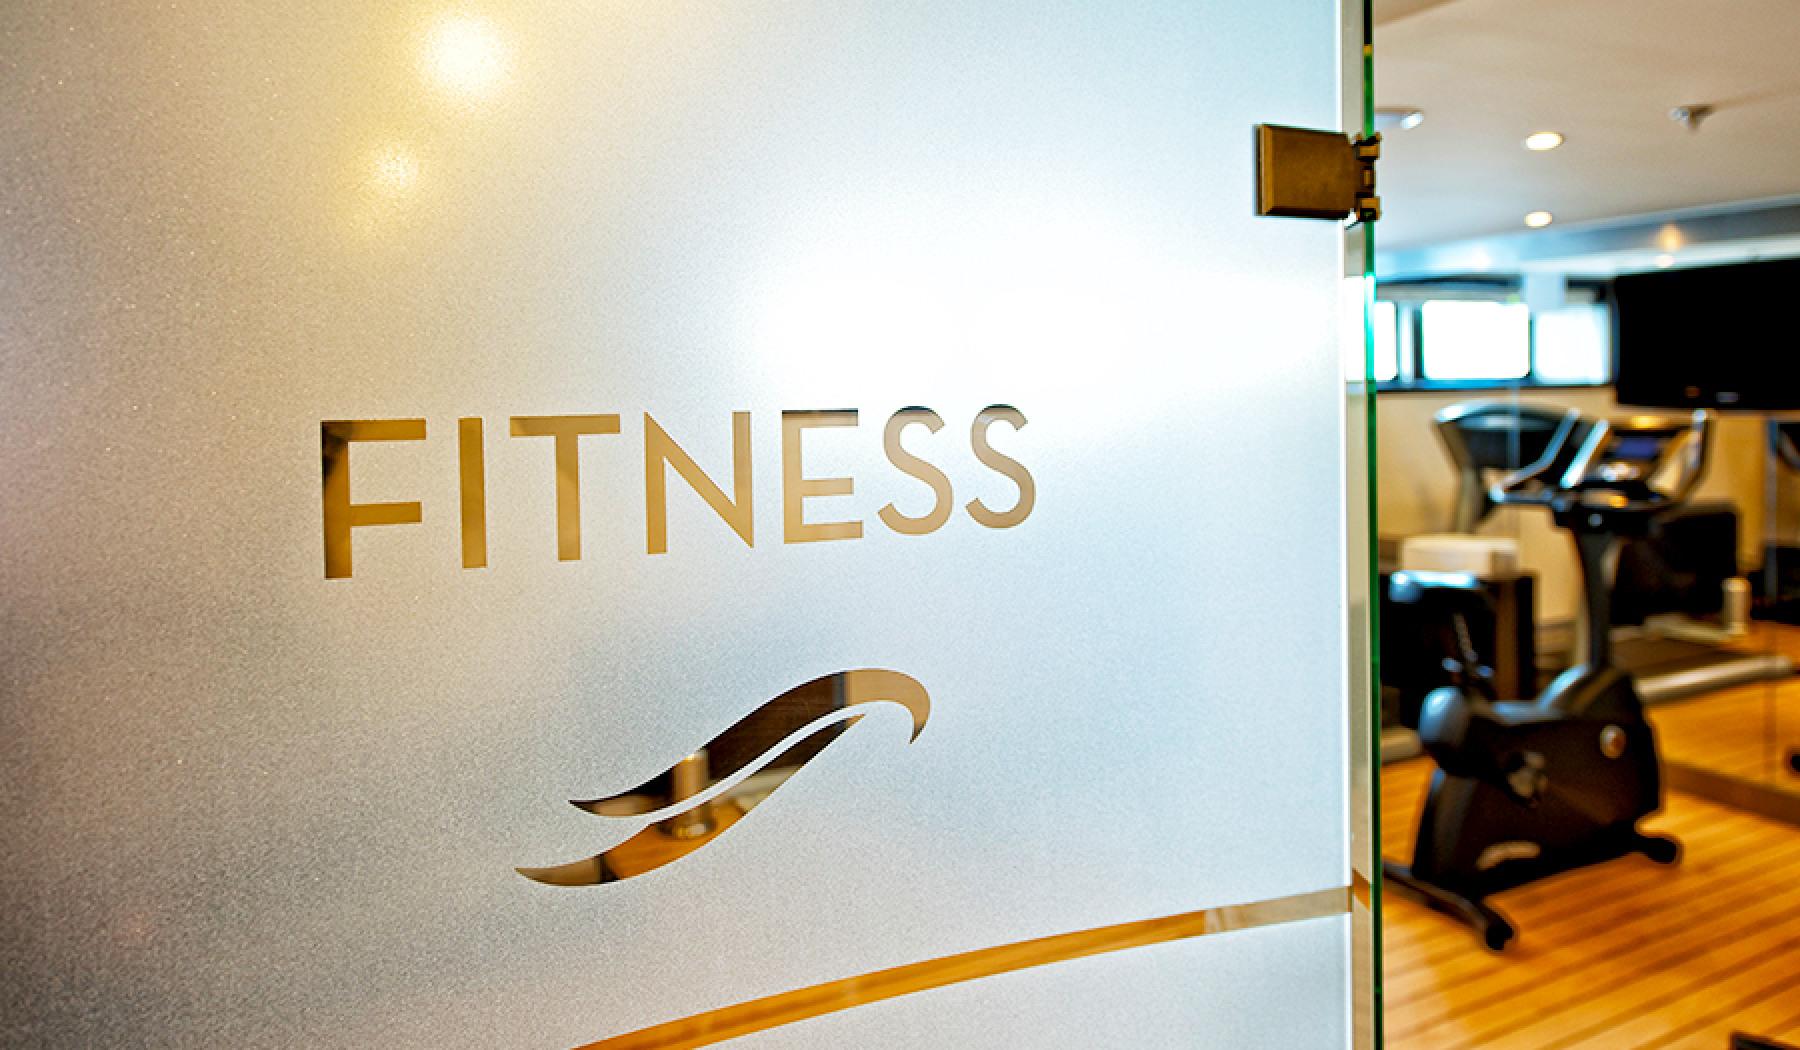 Avalon Waterways Avalon Vista Interior Fitness Centre Sign.jpg